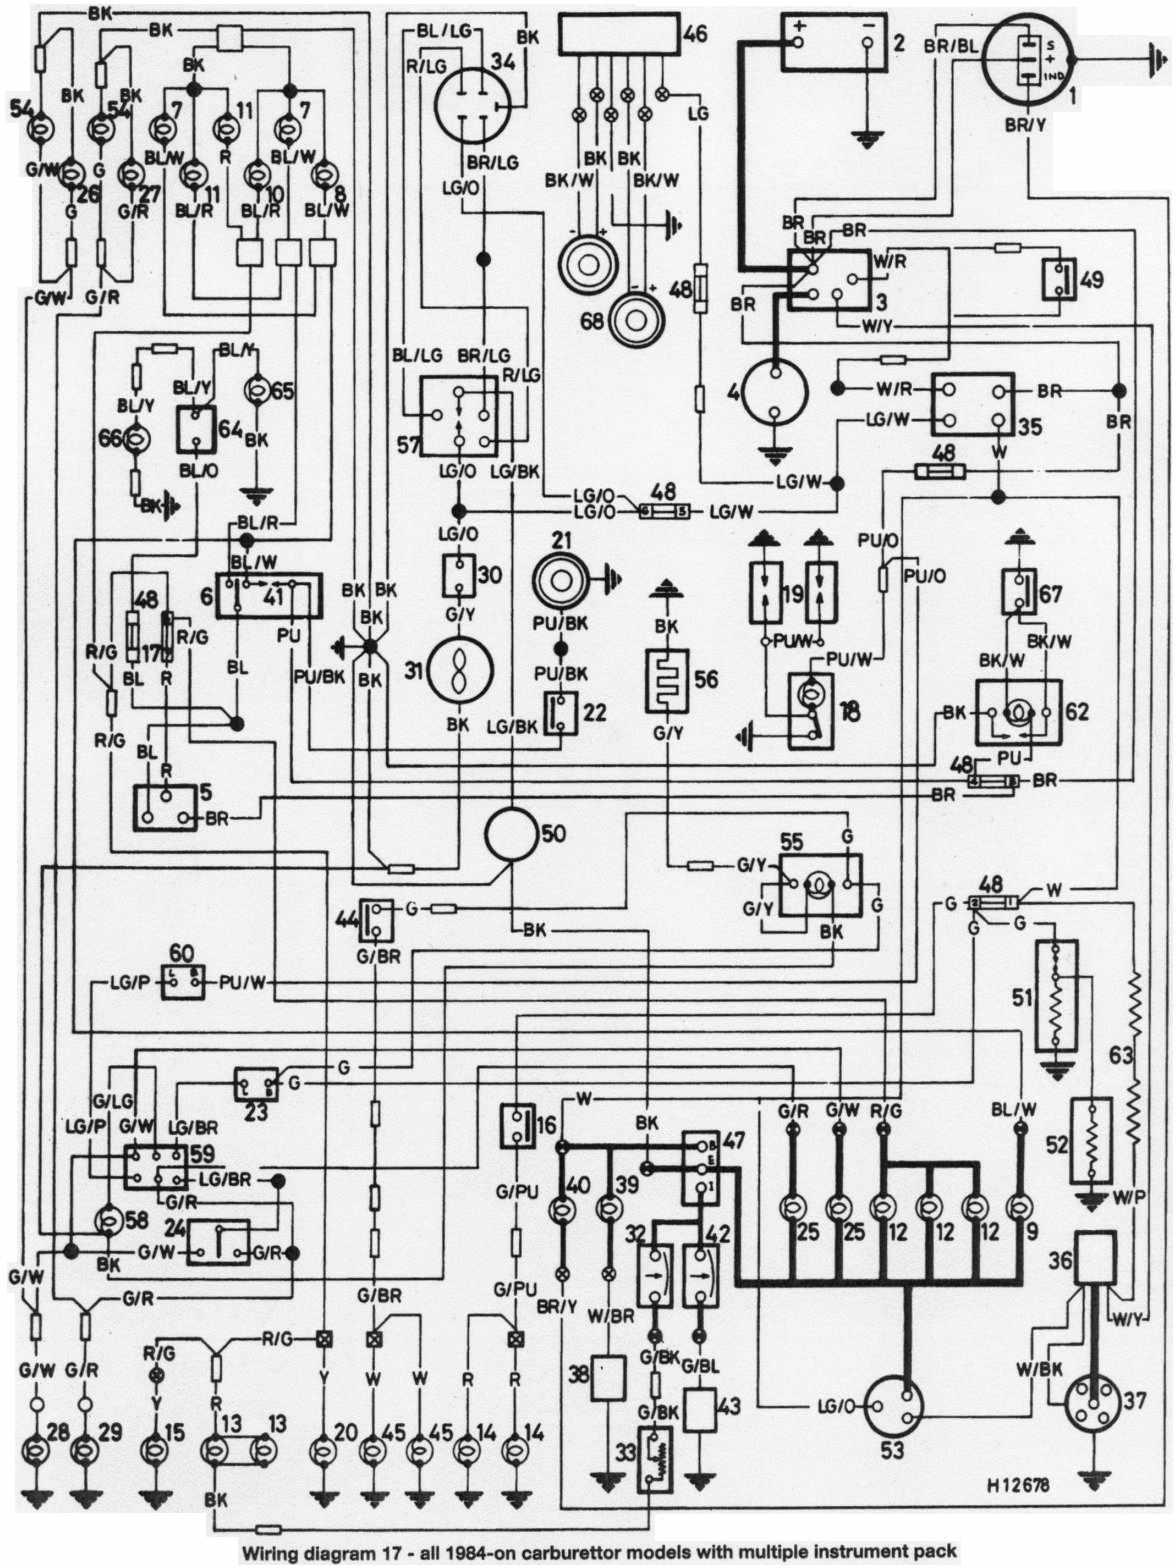 m400 wiring diagram wiring diagrams all topology basic flowcharting 2002 workhorse wiring-diagram 1975 winnebago wiring diagram free download wiring diagram wiring diagram of 1984 onwards all mini series